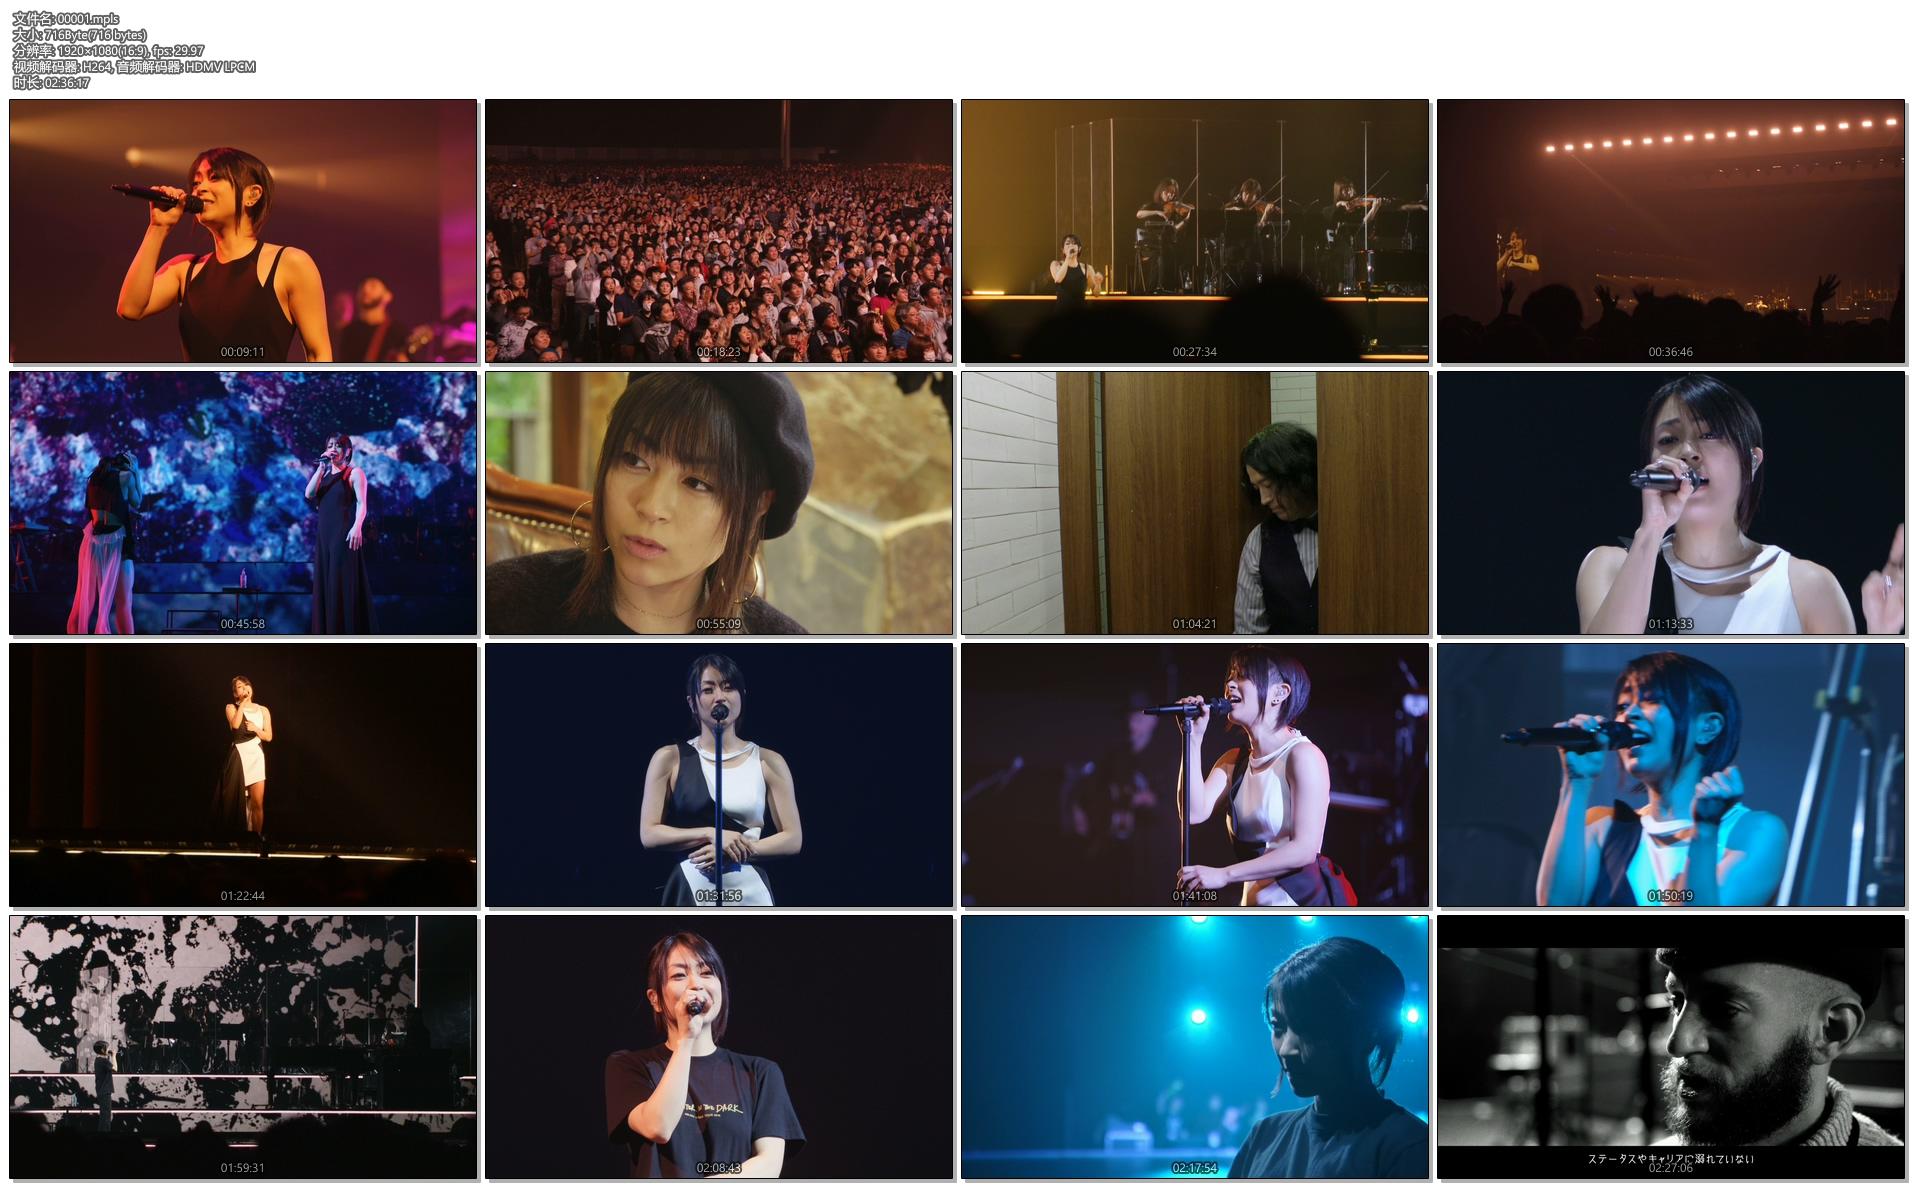 [蓝光原盘] 宇多田光2018千叶幕张演唱会Hikaru Utada Laughter in the Dark Tour 2018《ISO 43.6G》插图(2)